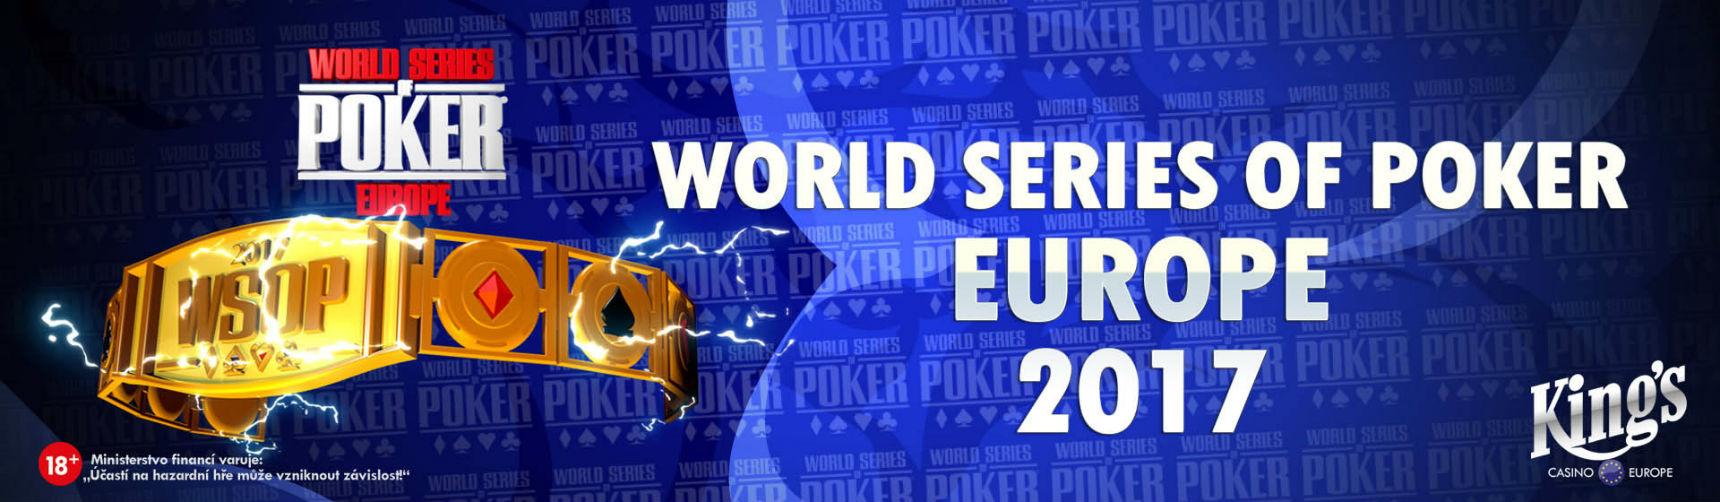 Best poker casinos europe casino gulfport biliox ms